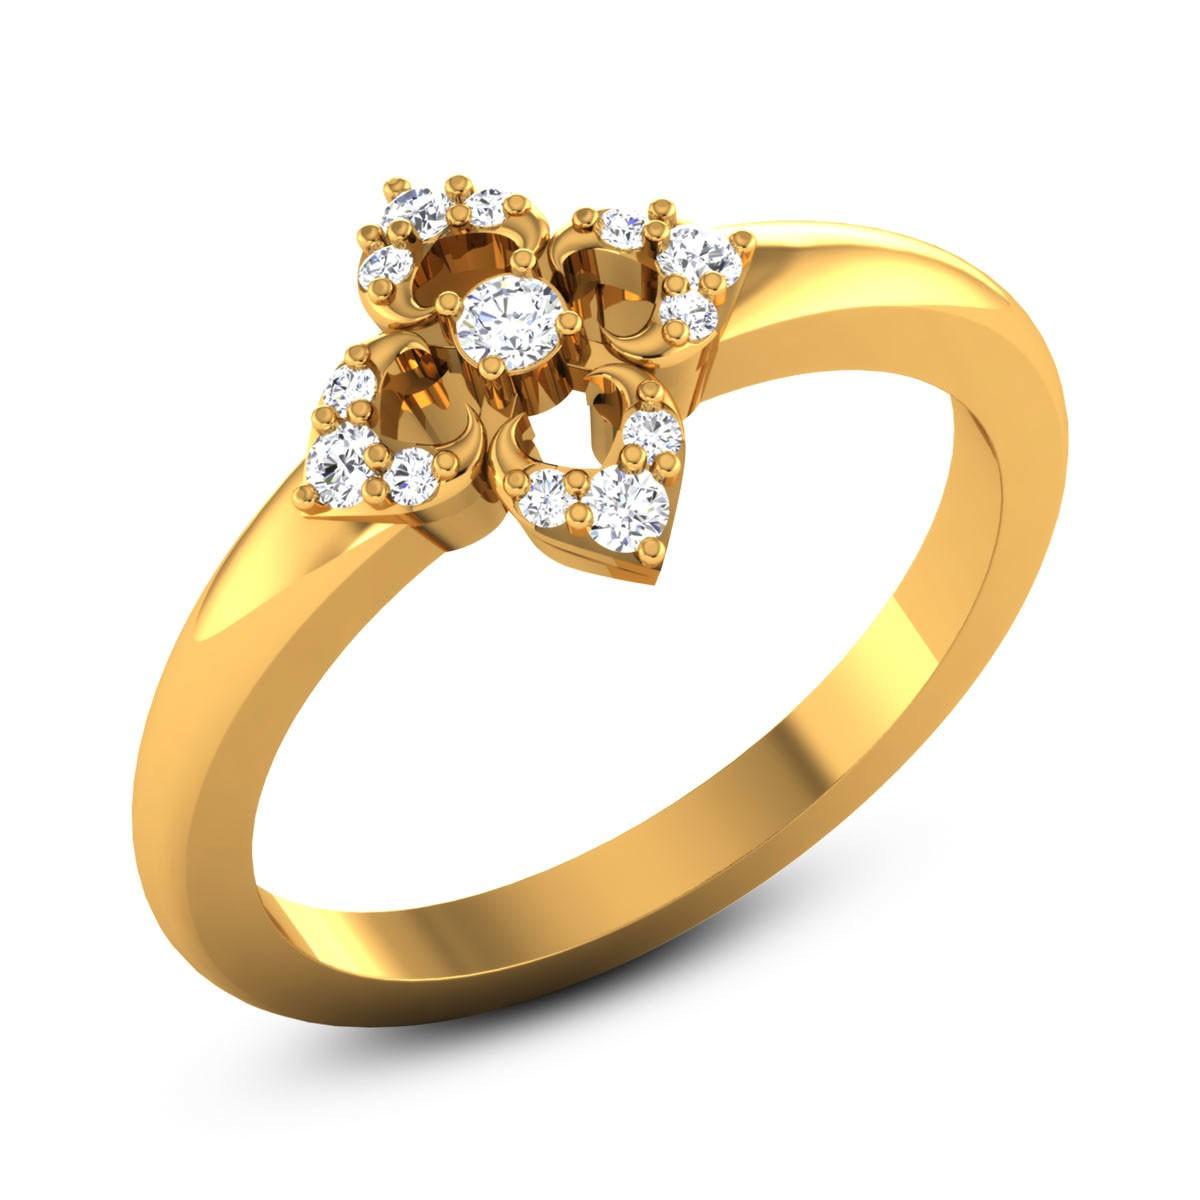 Aaron Diamond Floral Ring